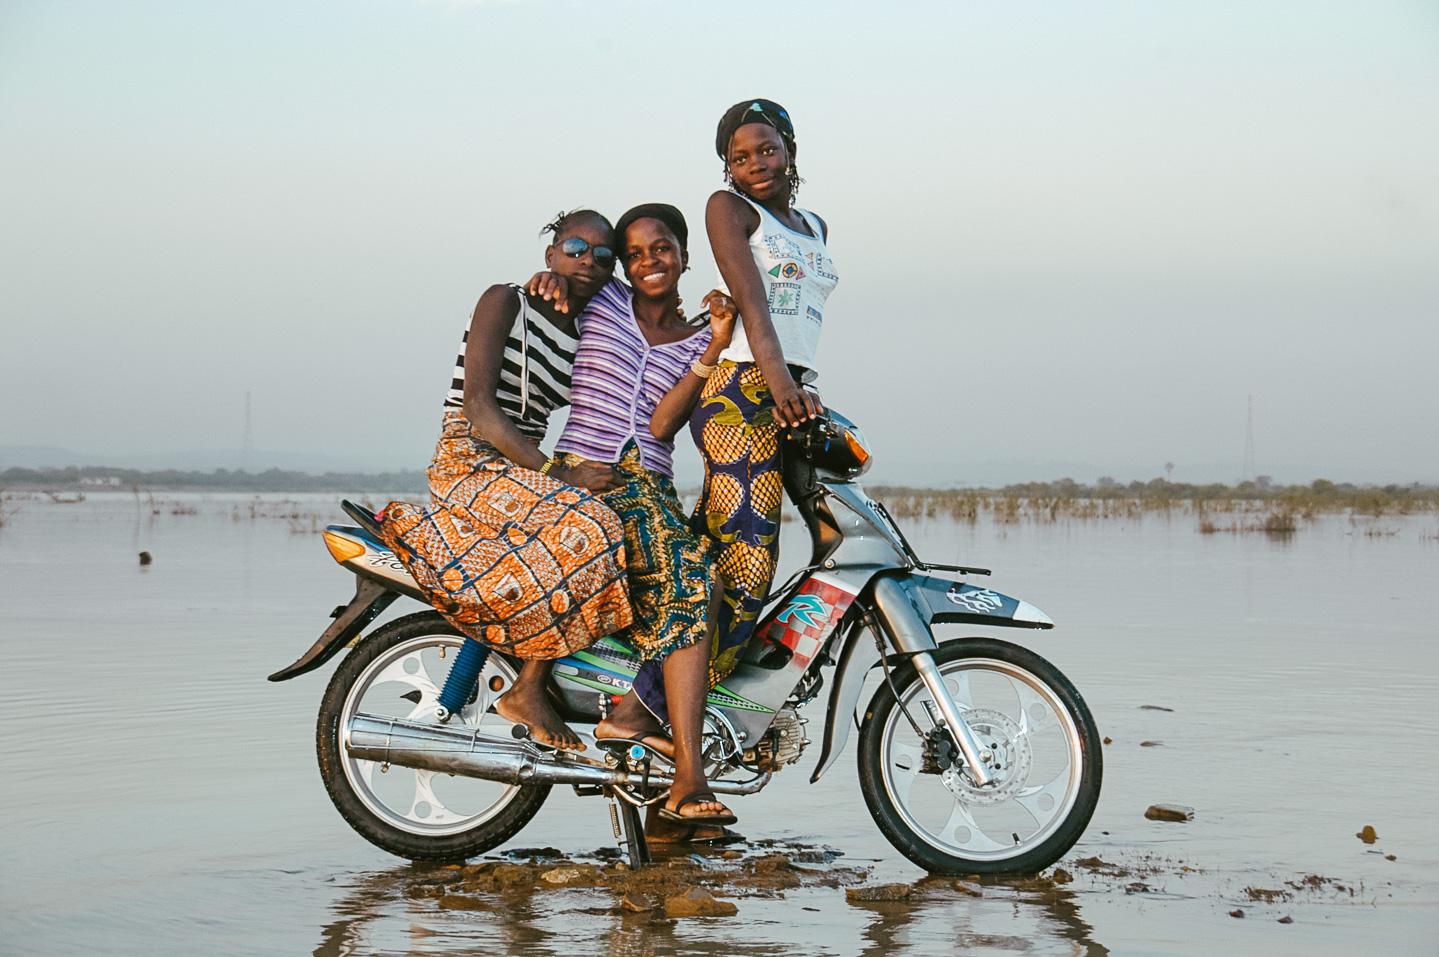 Rund um Afrika - Mali - Westafrika - Transafrika-410